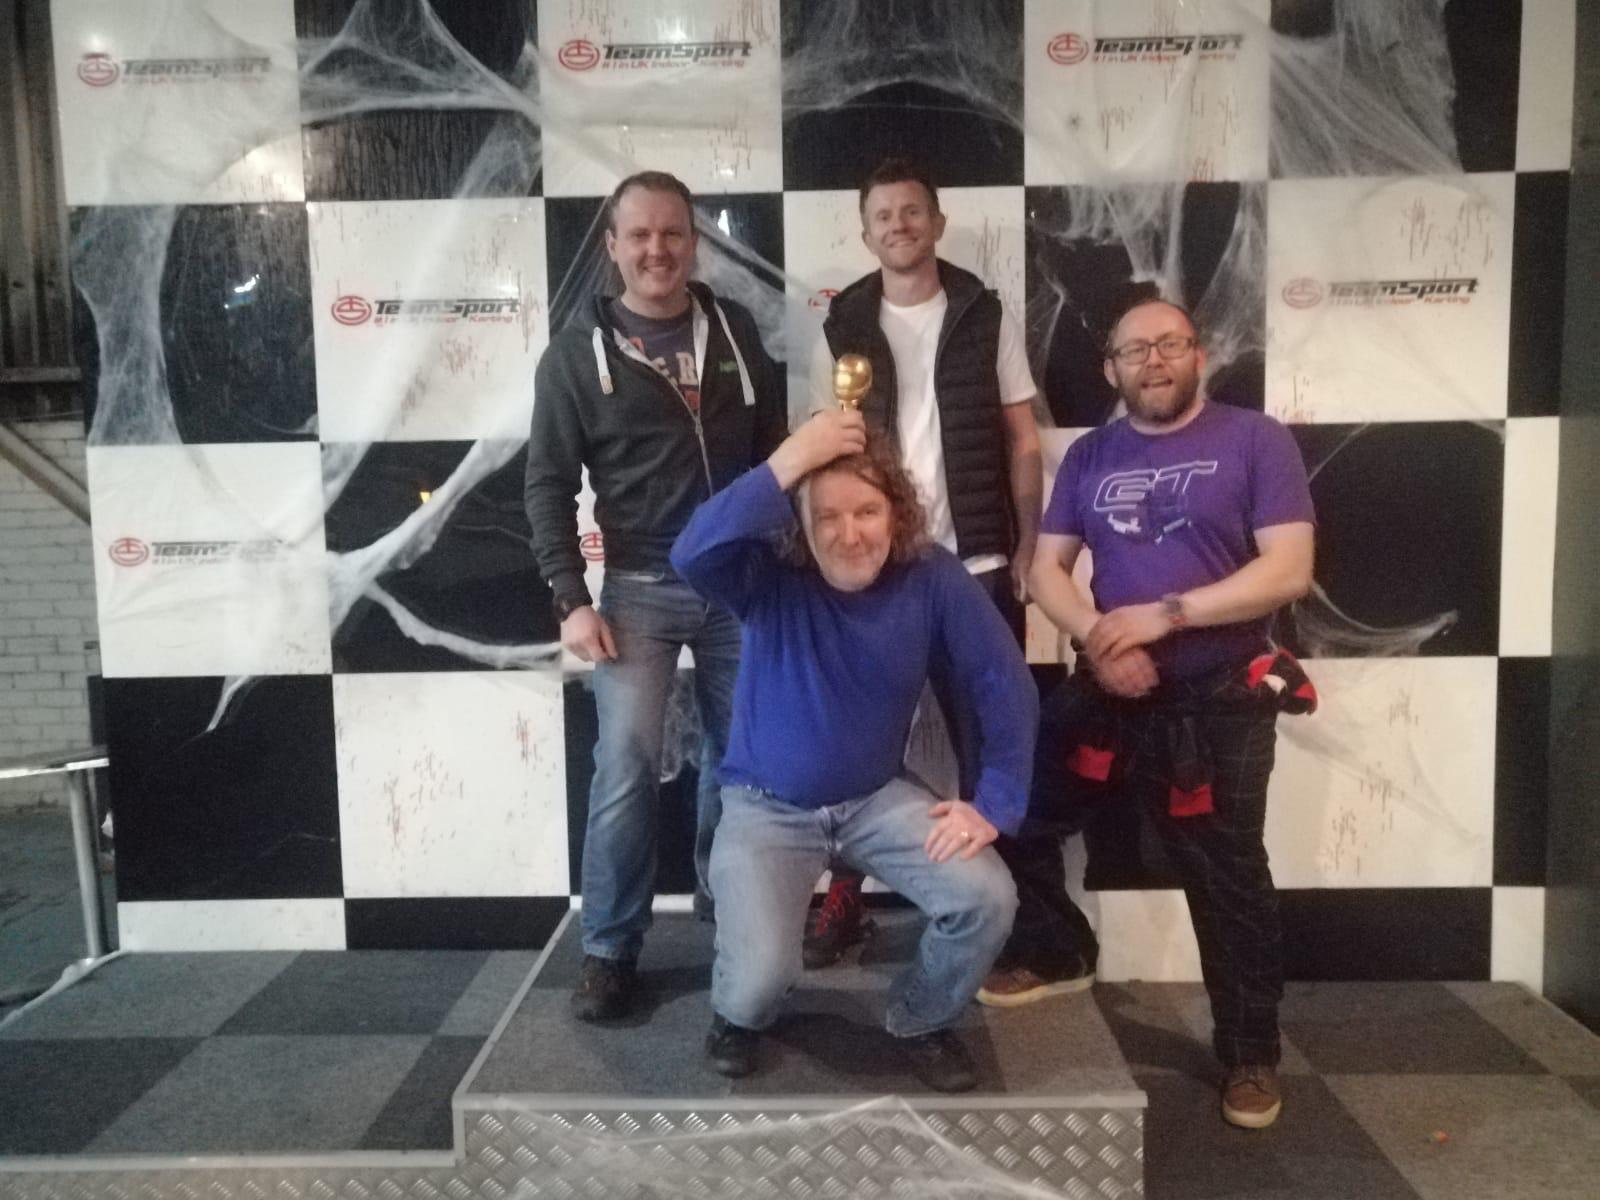 Go Kart Champions (again)!